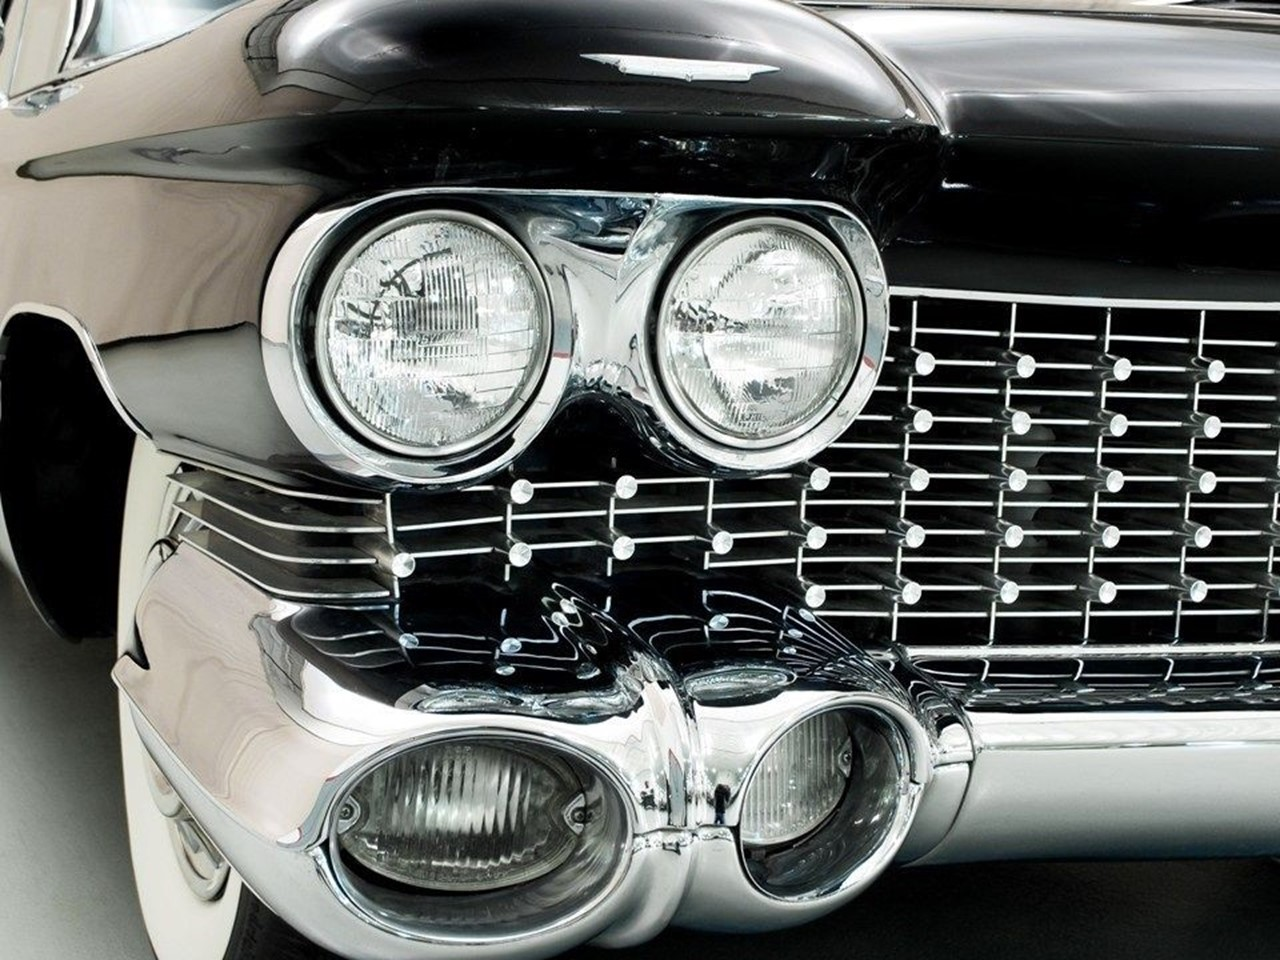 1959 Series 6900 Eldorado Brougham 1